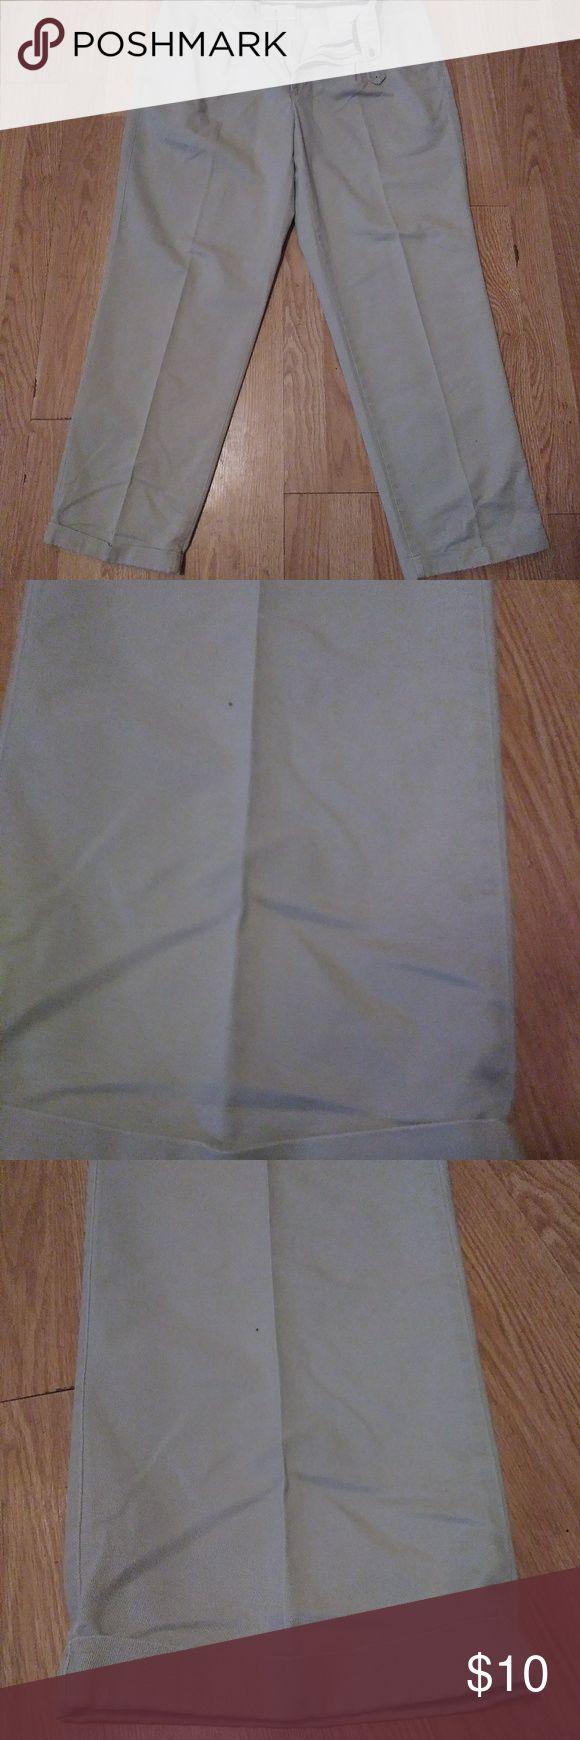 Savane Motion Mens Tan Pleated Cuffed Pants 38X32 Waist 19in Length 42in Inseam 3in Cuff Rise12in  1-0091.1 Savane Pants Dress